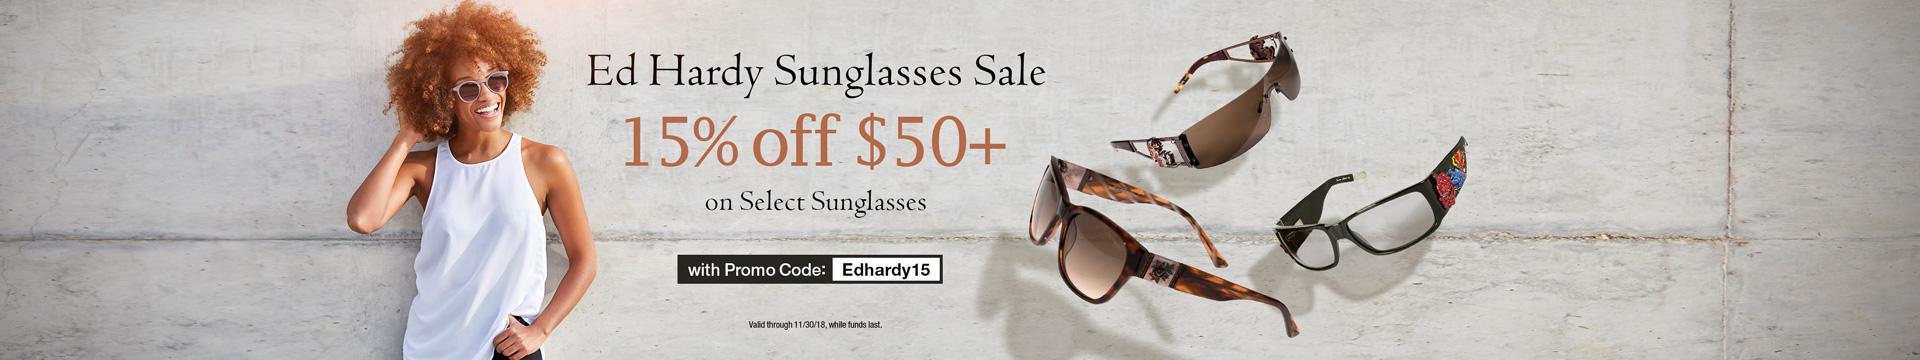 15% off $50+ on Select Sunglass